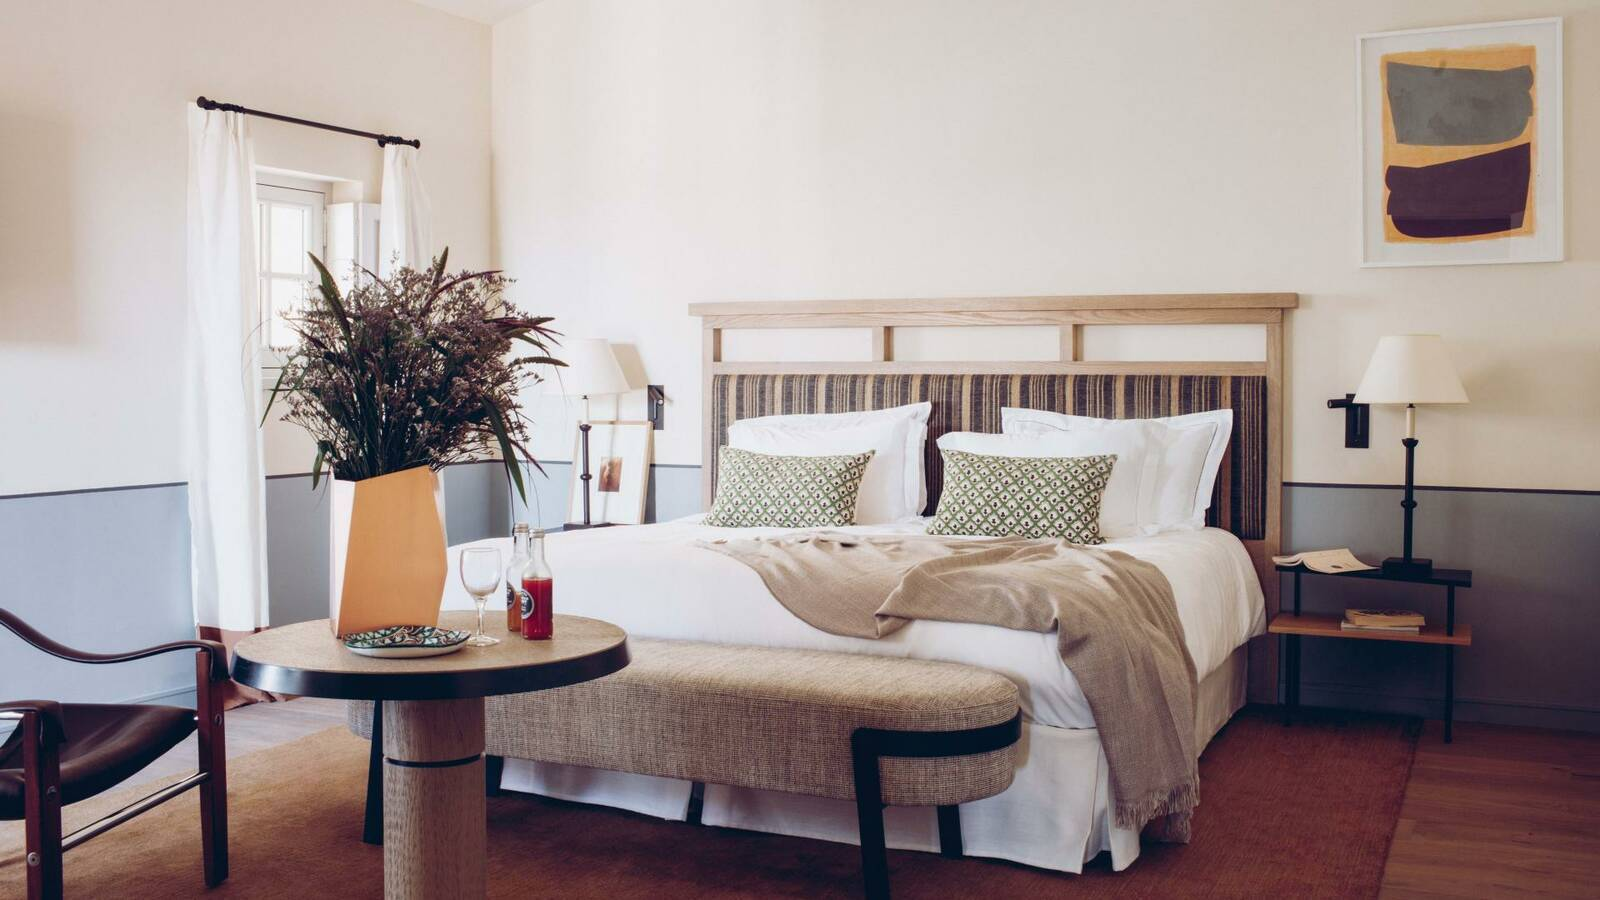 Hotel crillon le brave chambre Provence Maisons Pariente